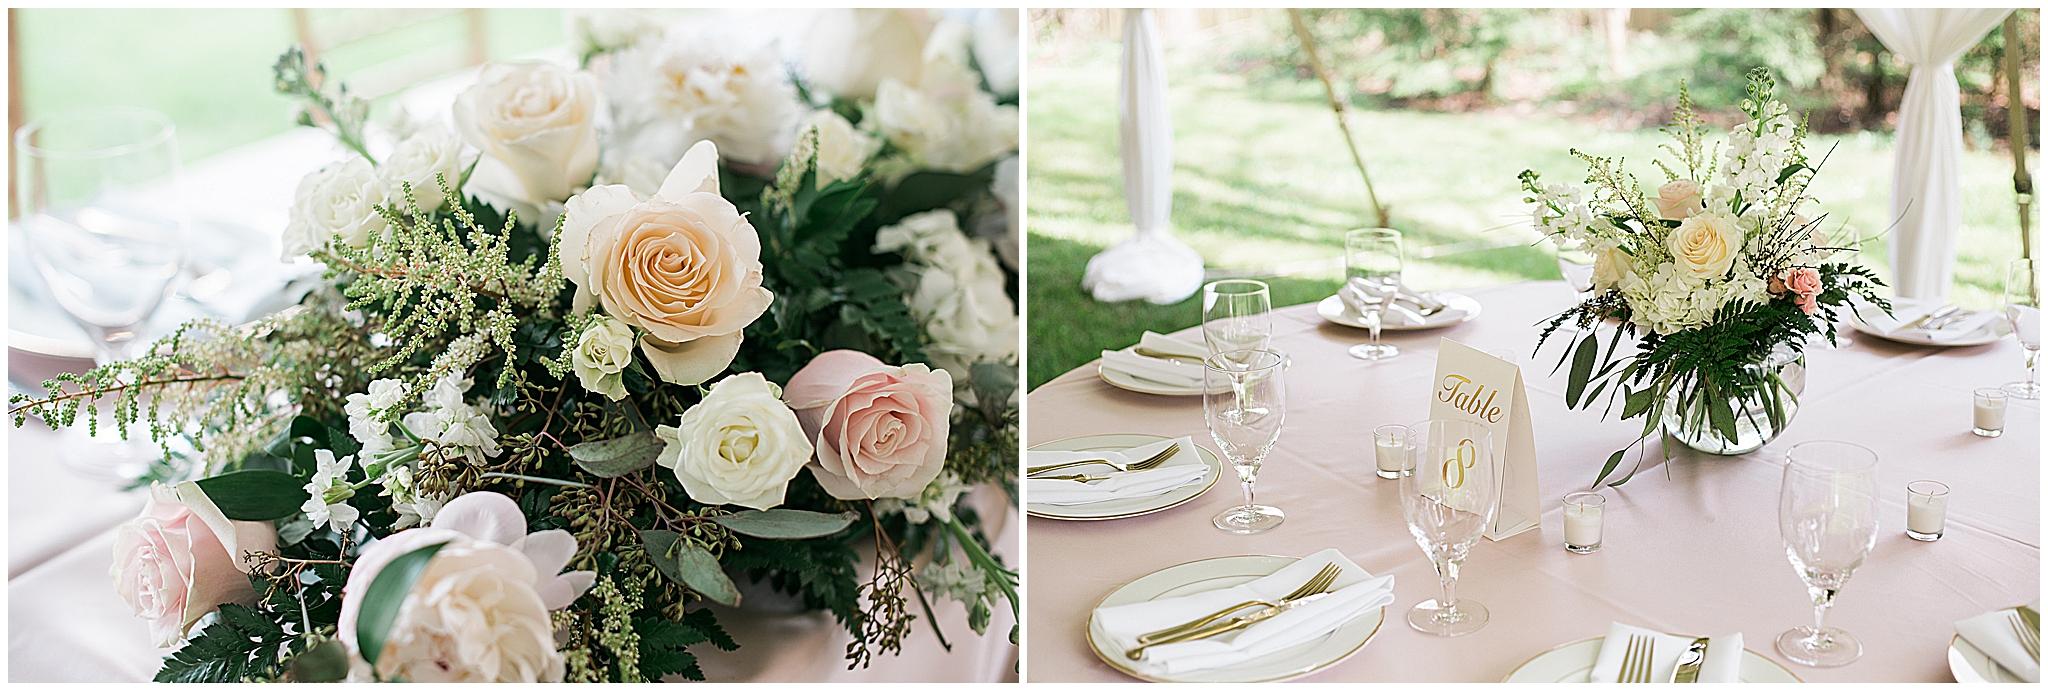 Wedding_Photographers_Asheville_Mountain_Magnolia_Inn_0026.jpg